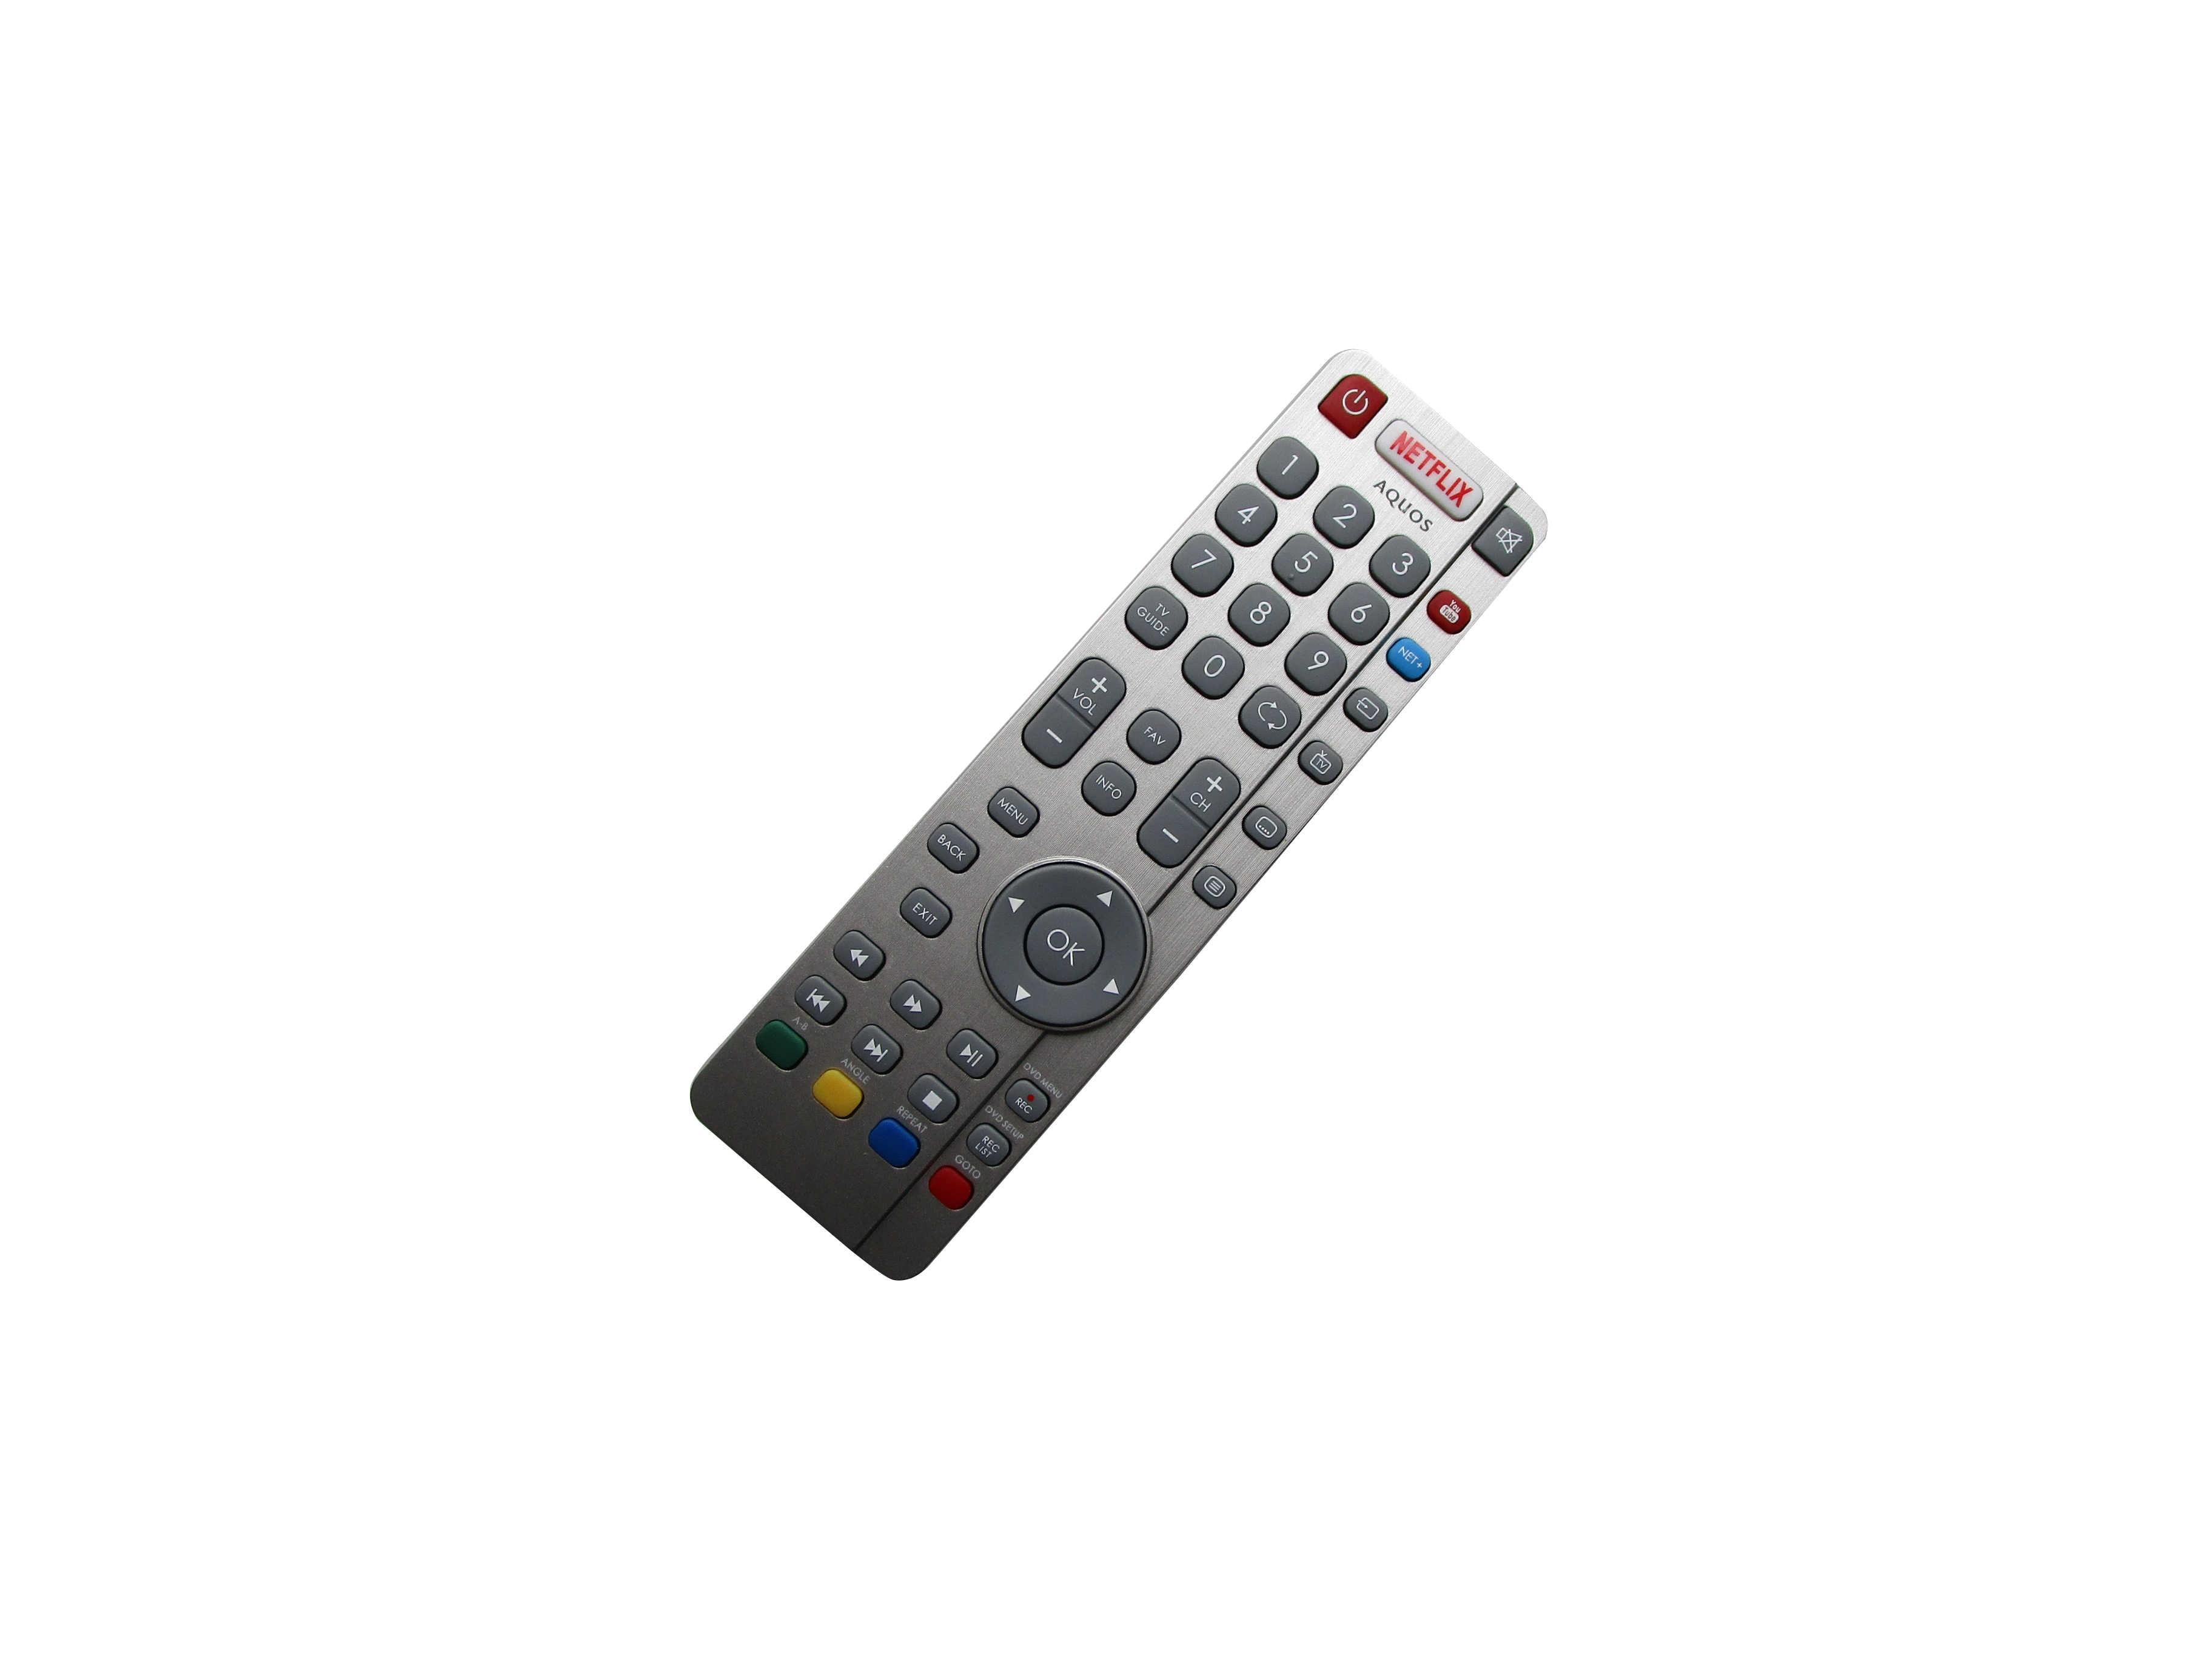 Originale Fernbedienung Sharp TV LC-43CFF6001KLC-43CFF6002ELC-43CFG6002E